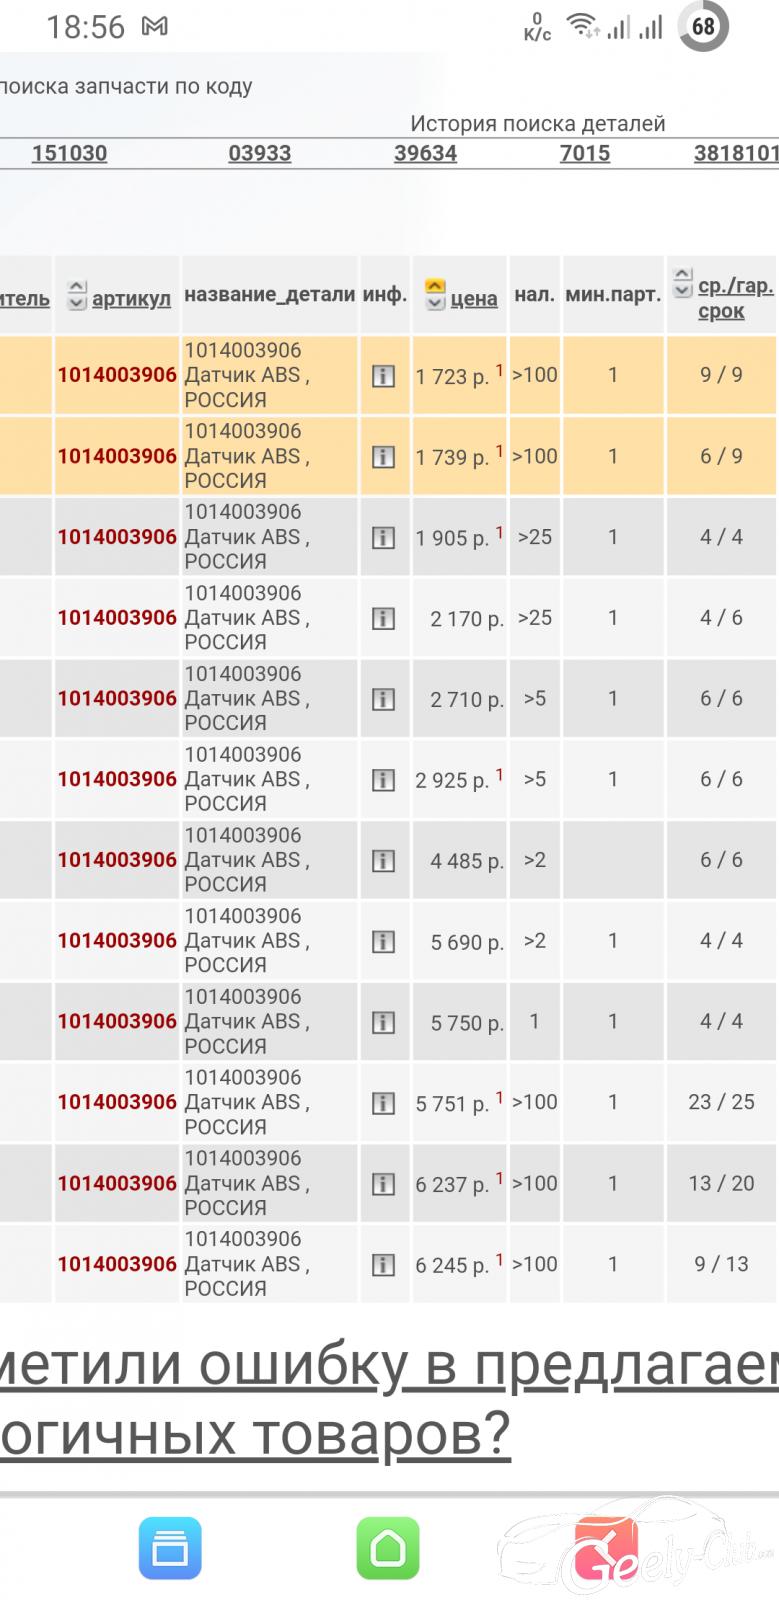 Screenshot_14.03.21-18.56.13_Chrome.png